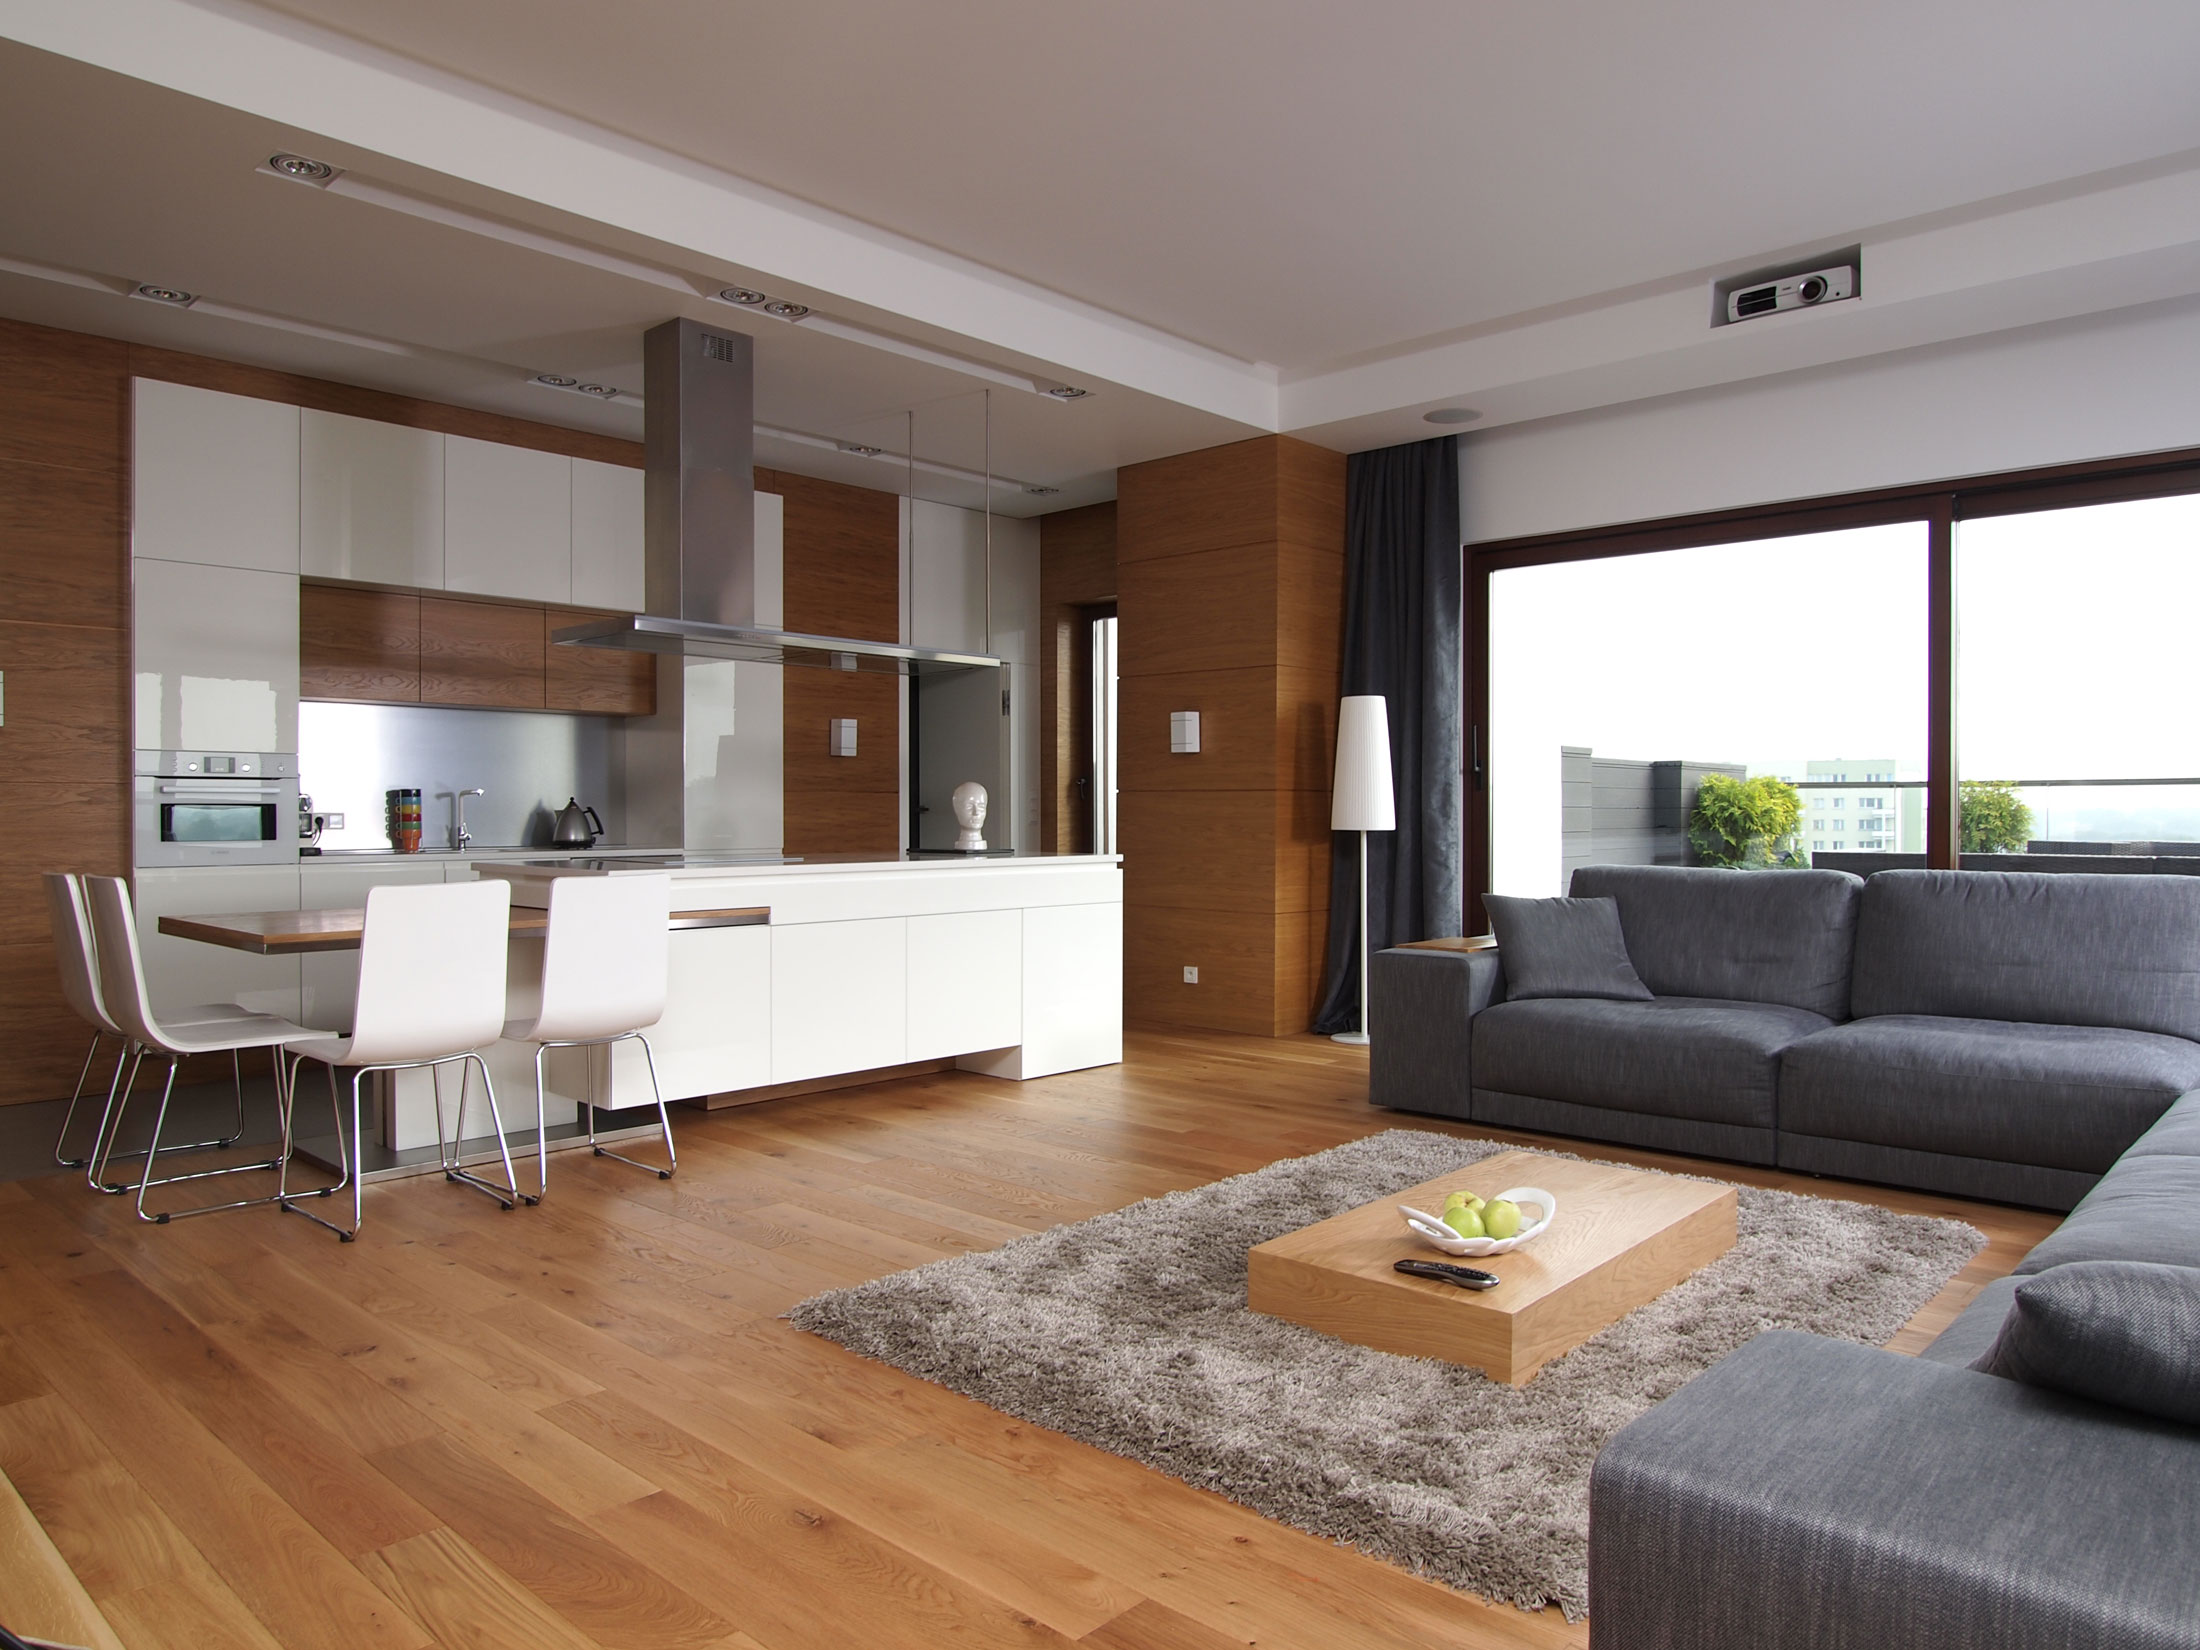 Ламинат в интерьере квартиры